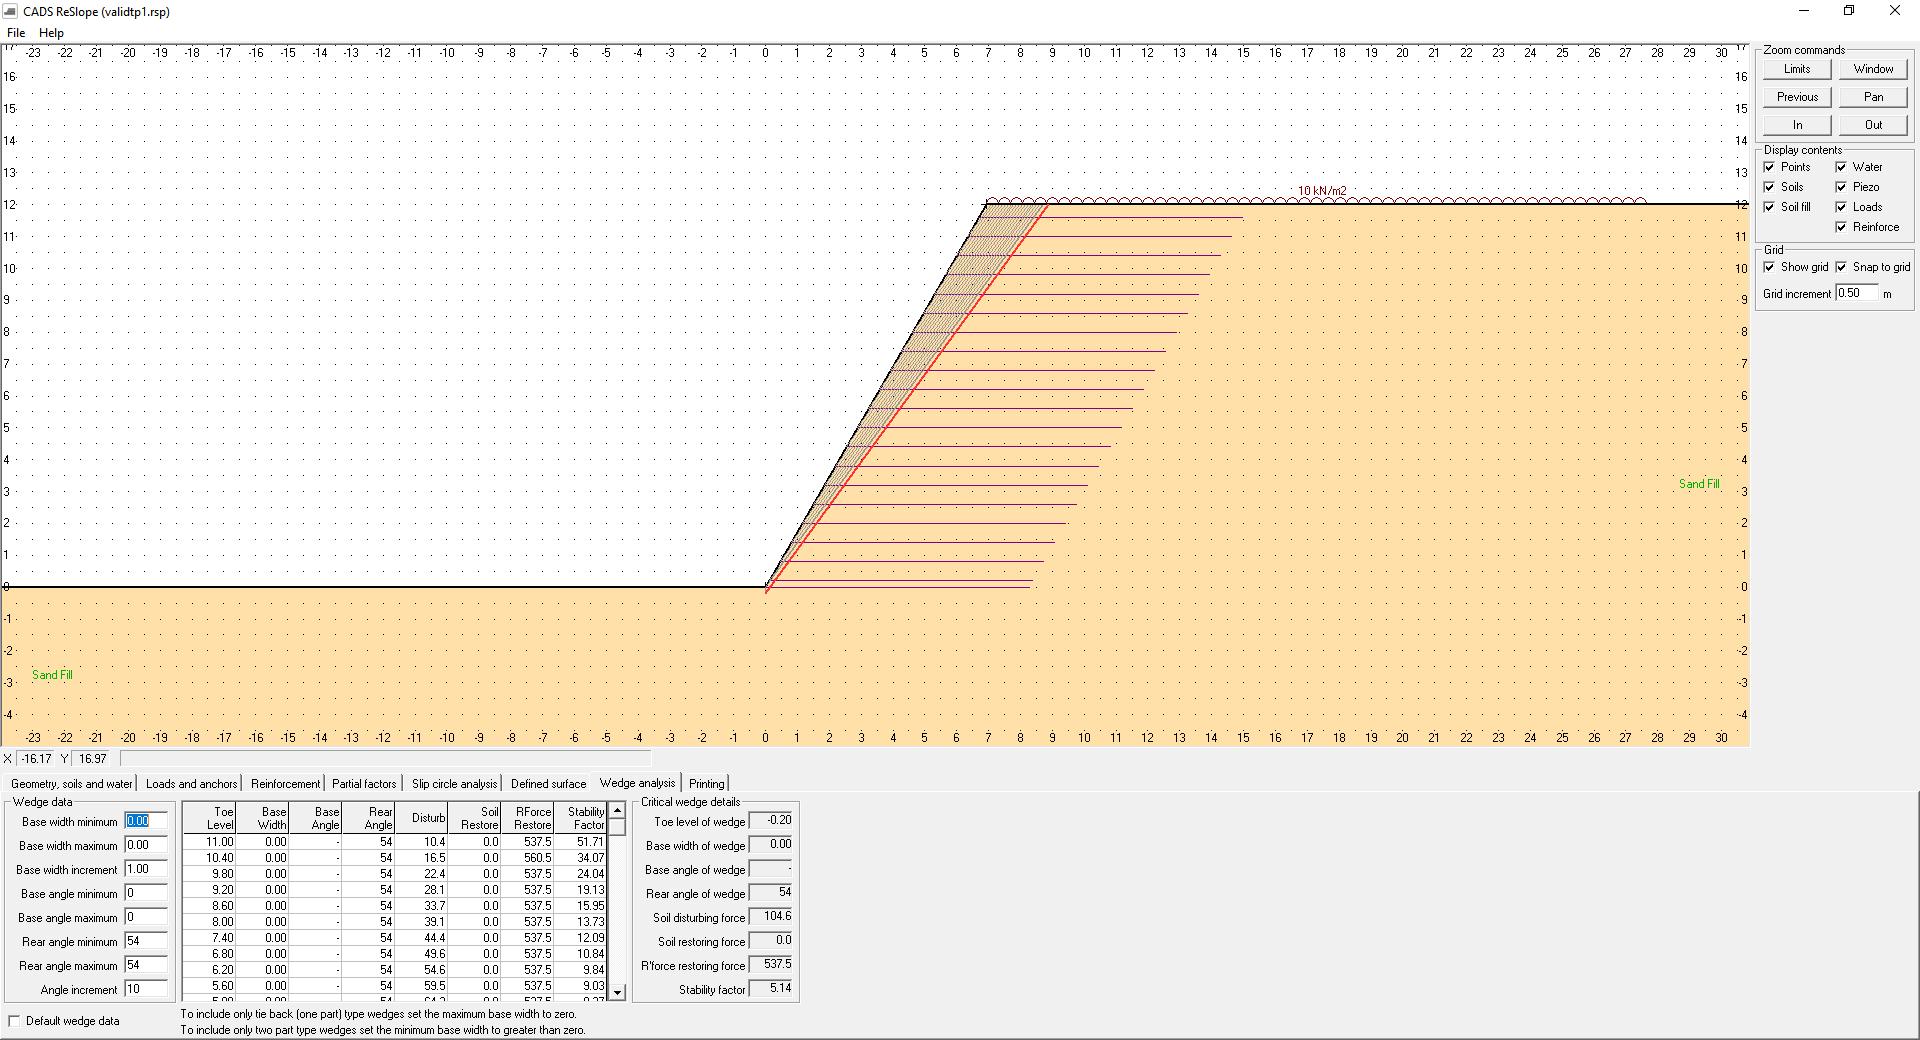 Tie back wedge analysis